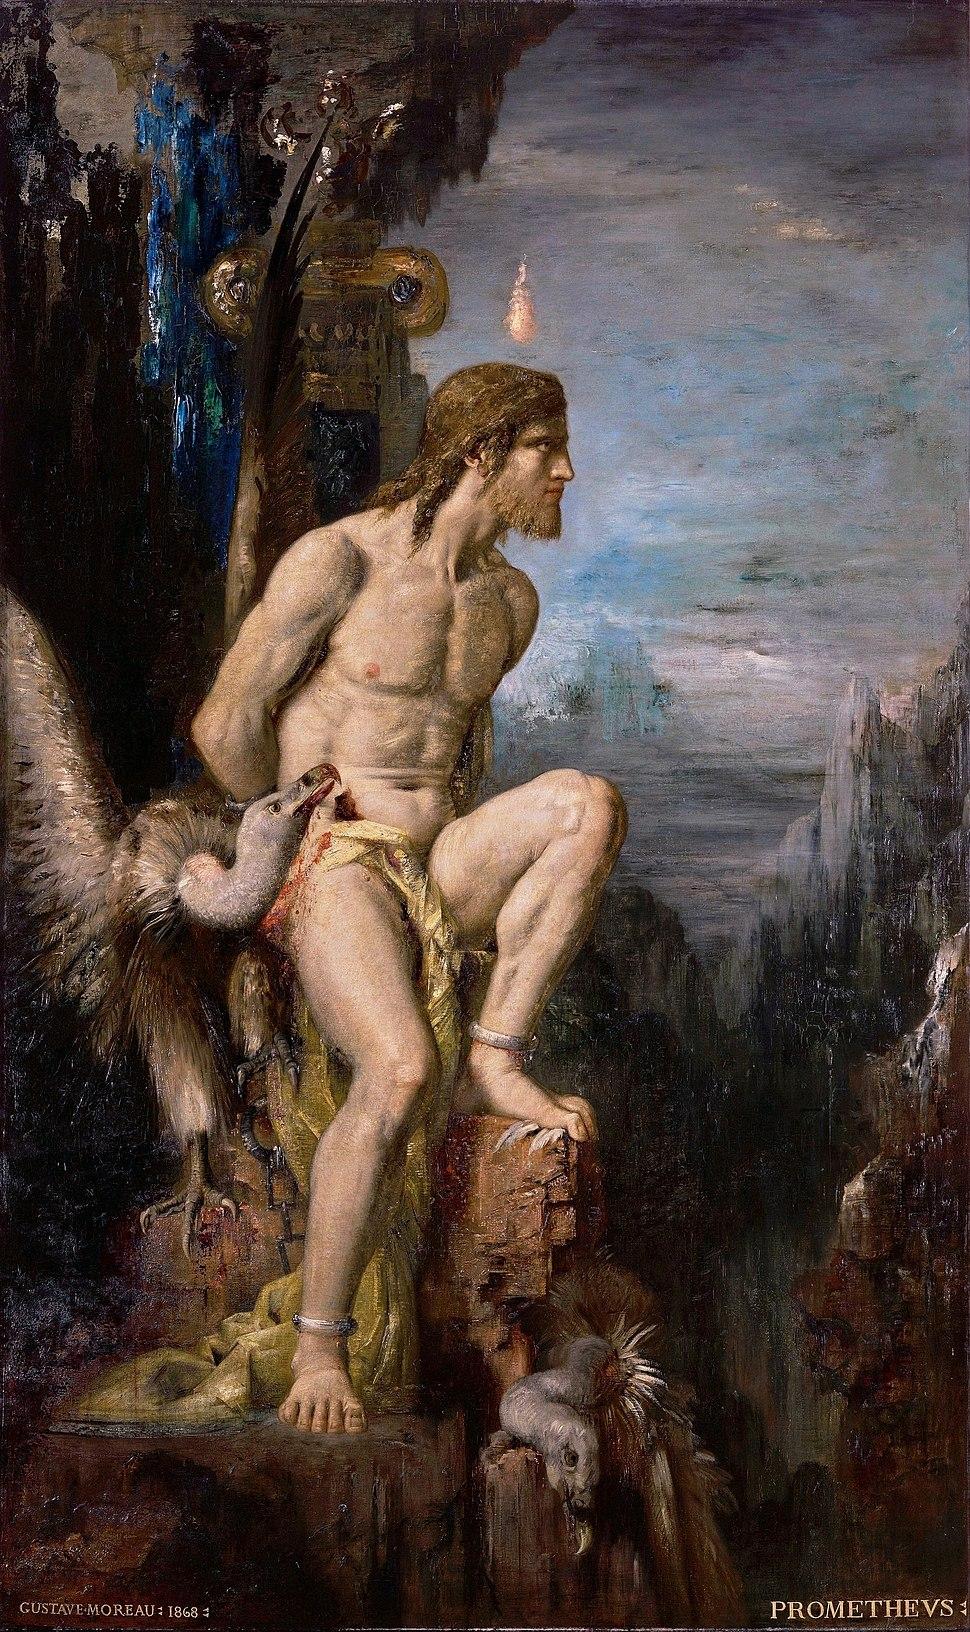 Prometheus by Gustave Moreau